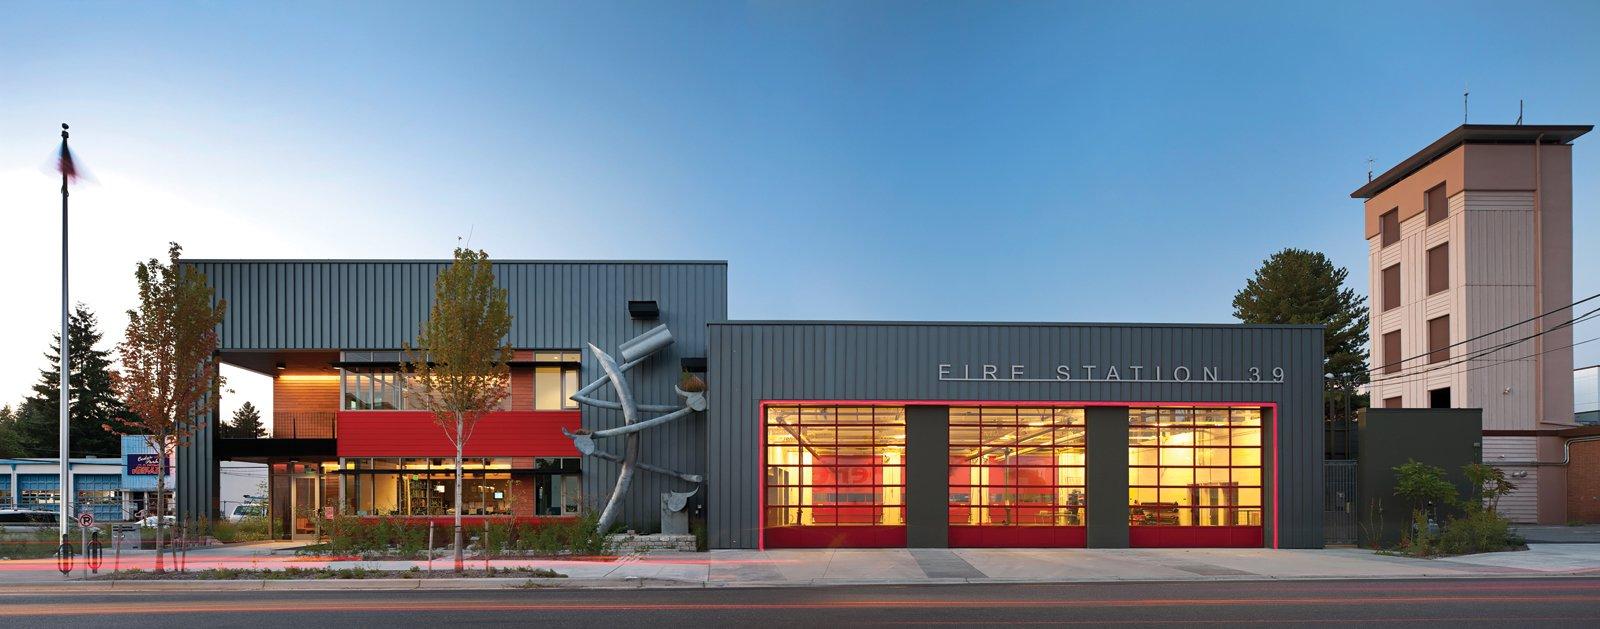 Seattle S Fire Stations Get An Overhaul Dwell